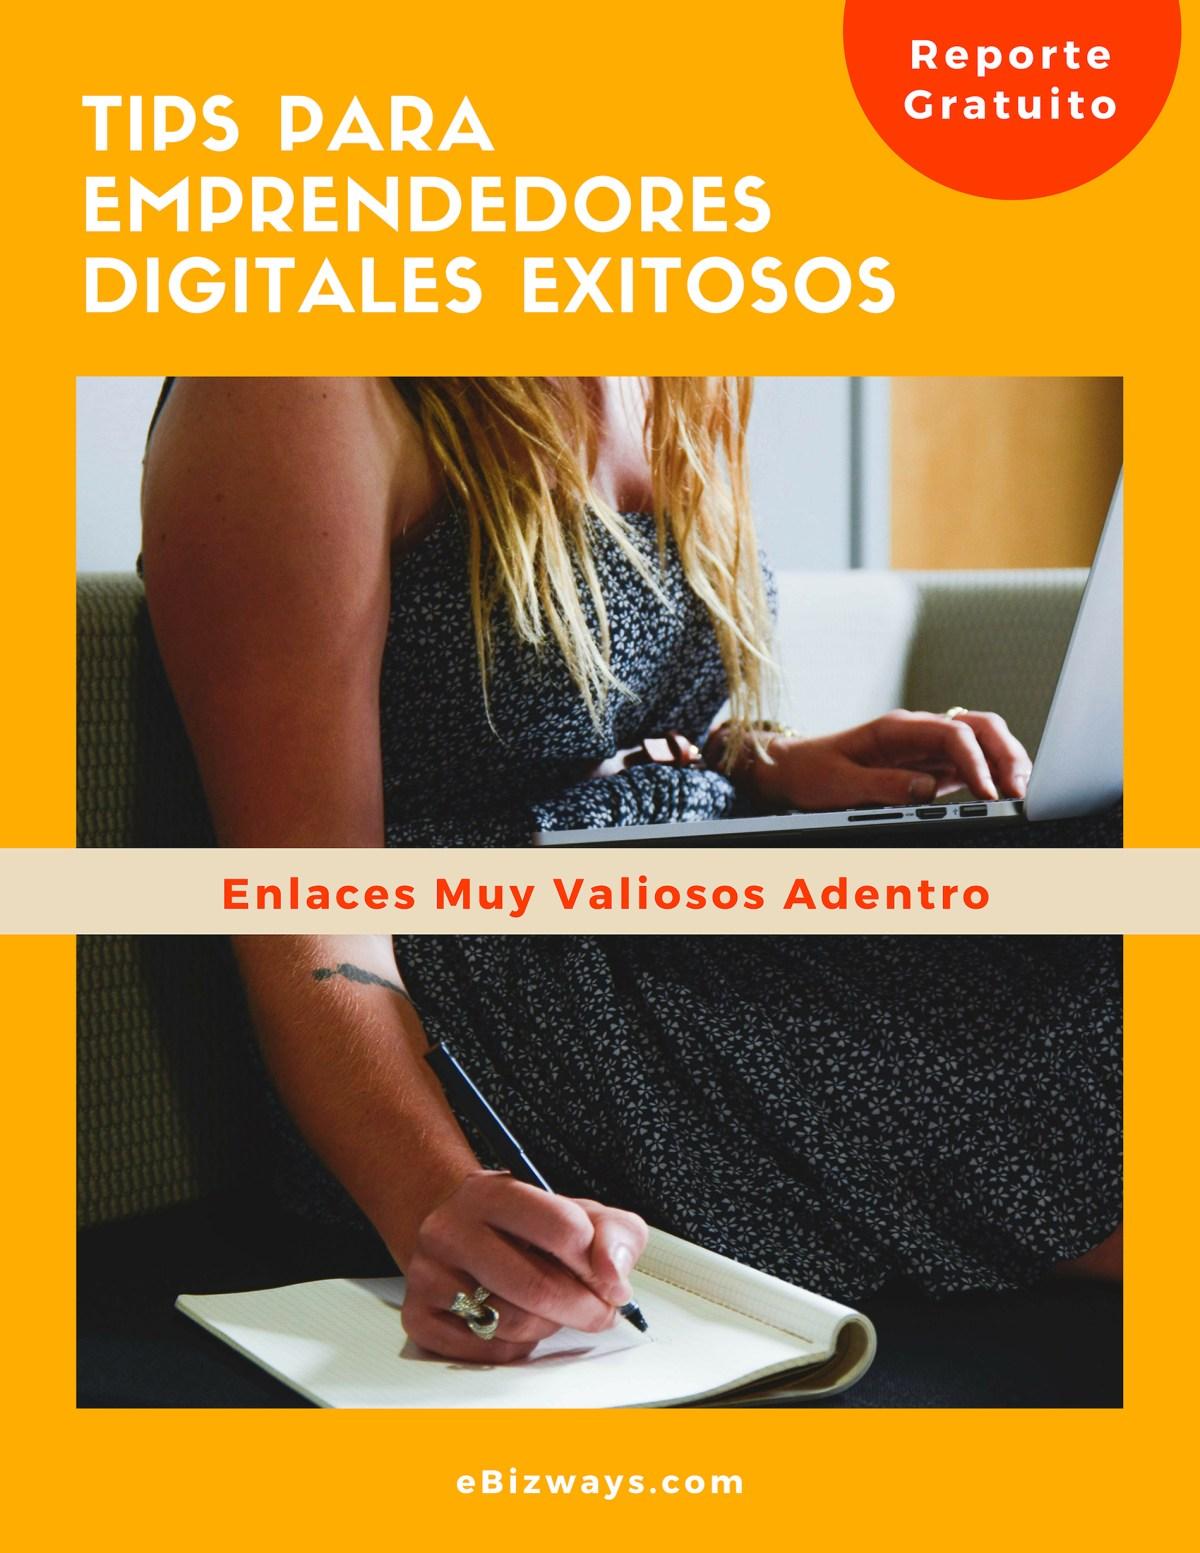 tips emprendedores digitales abr19